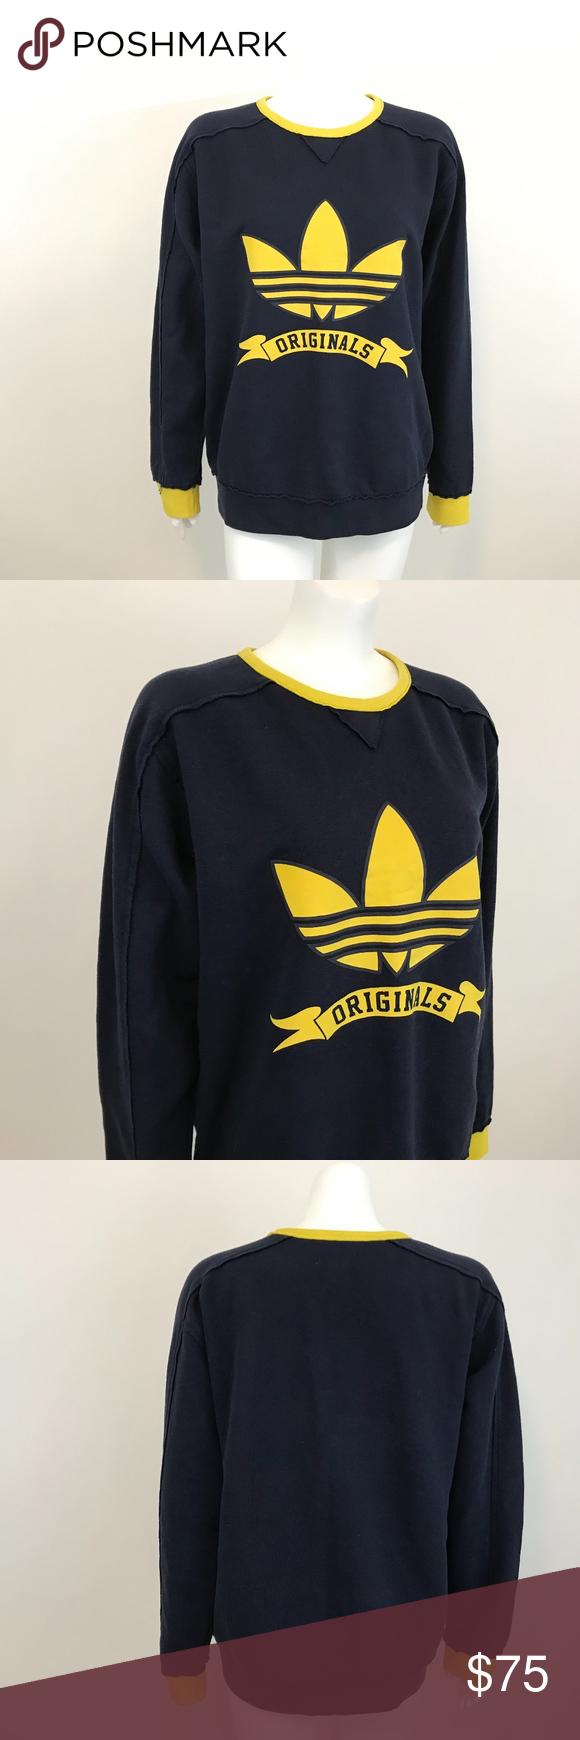 Adidas Originals Trefoil Crewneck Sweatshirt M Trendy Sweatshirt Sweatshirts Sweatshirt Refashion [ 1740 x 580 Pixel ]